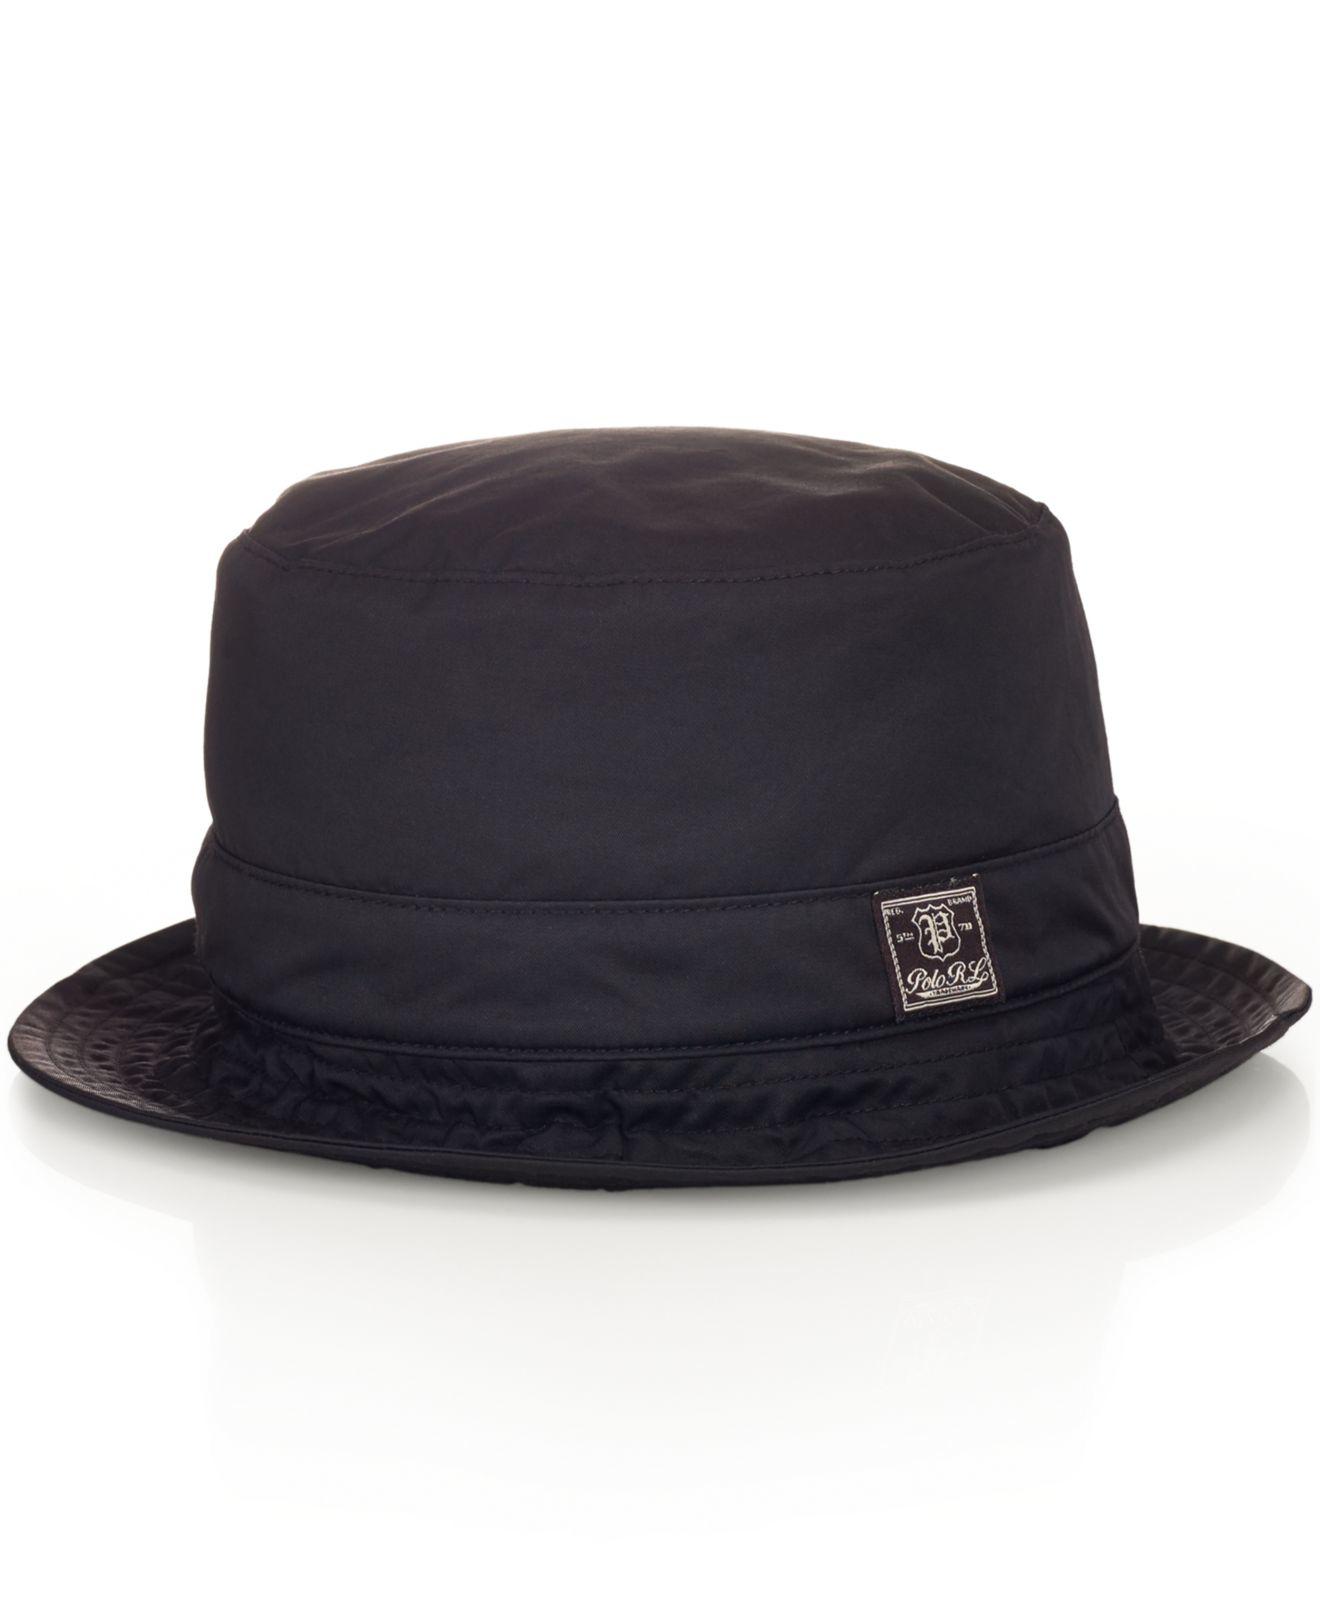 Lyst - Polo Ralph Lauren Twill Bucket Hat in Black for Men ab348ce441b